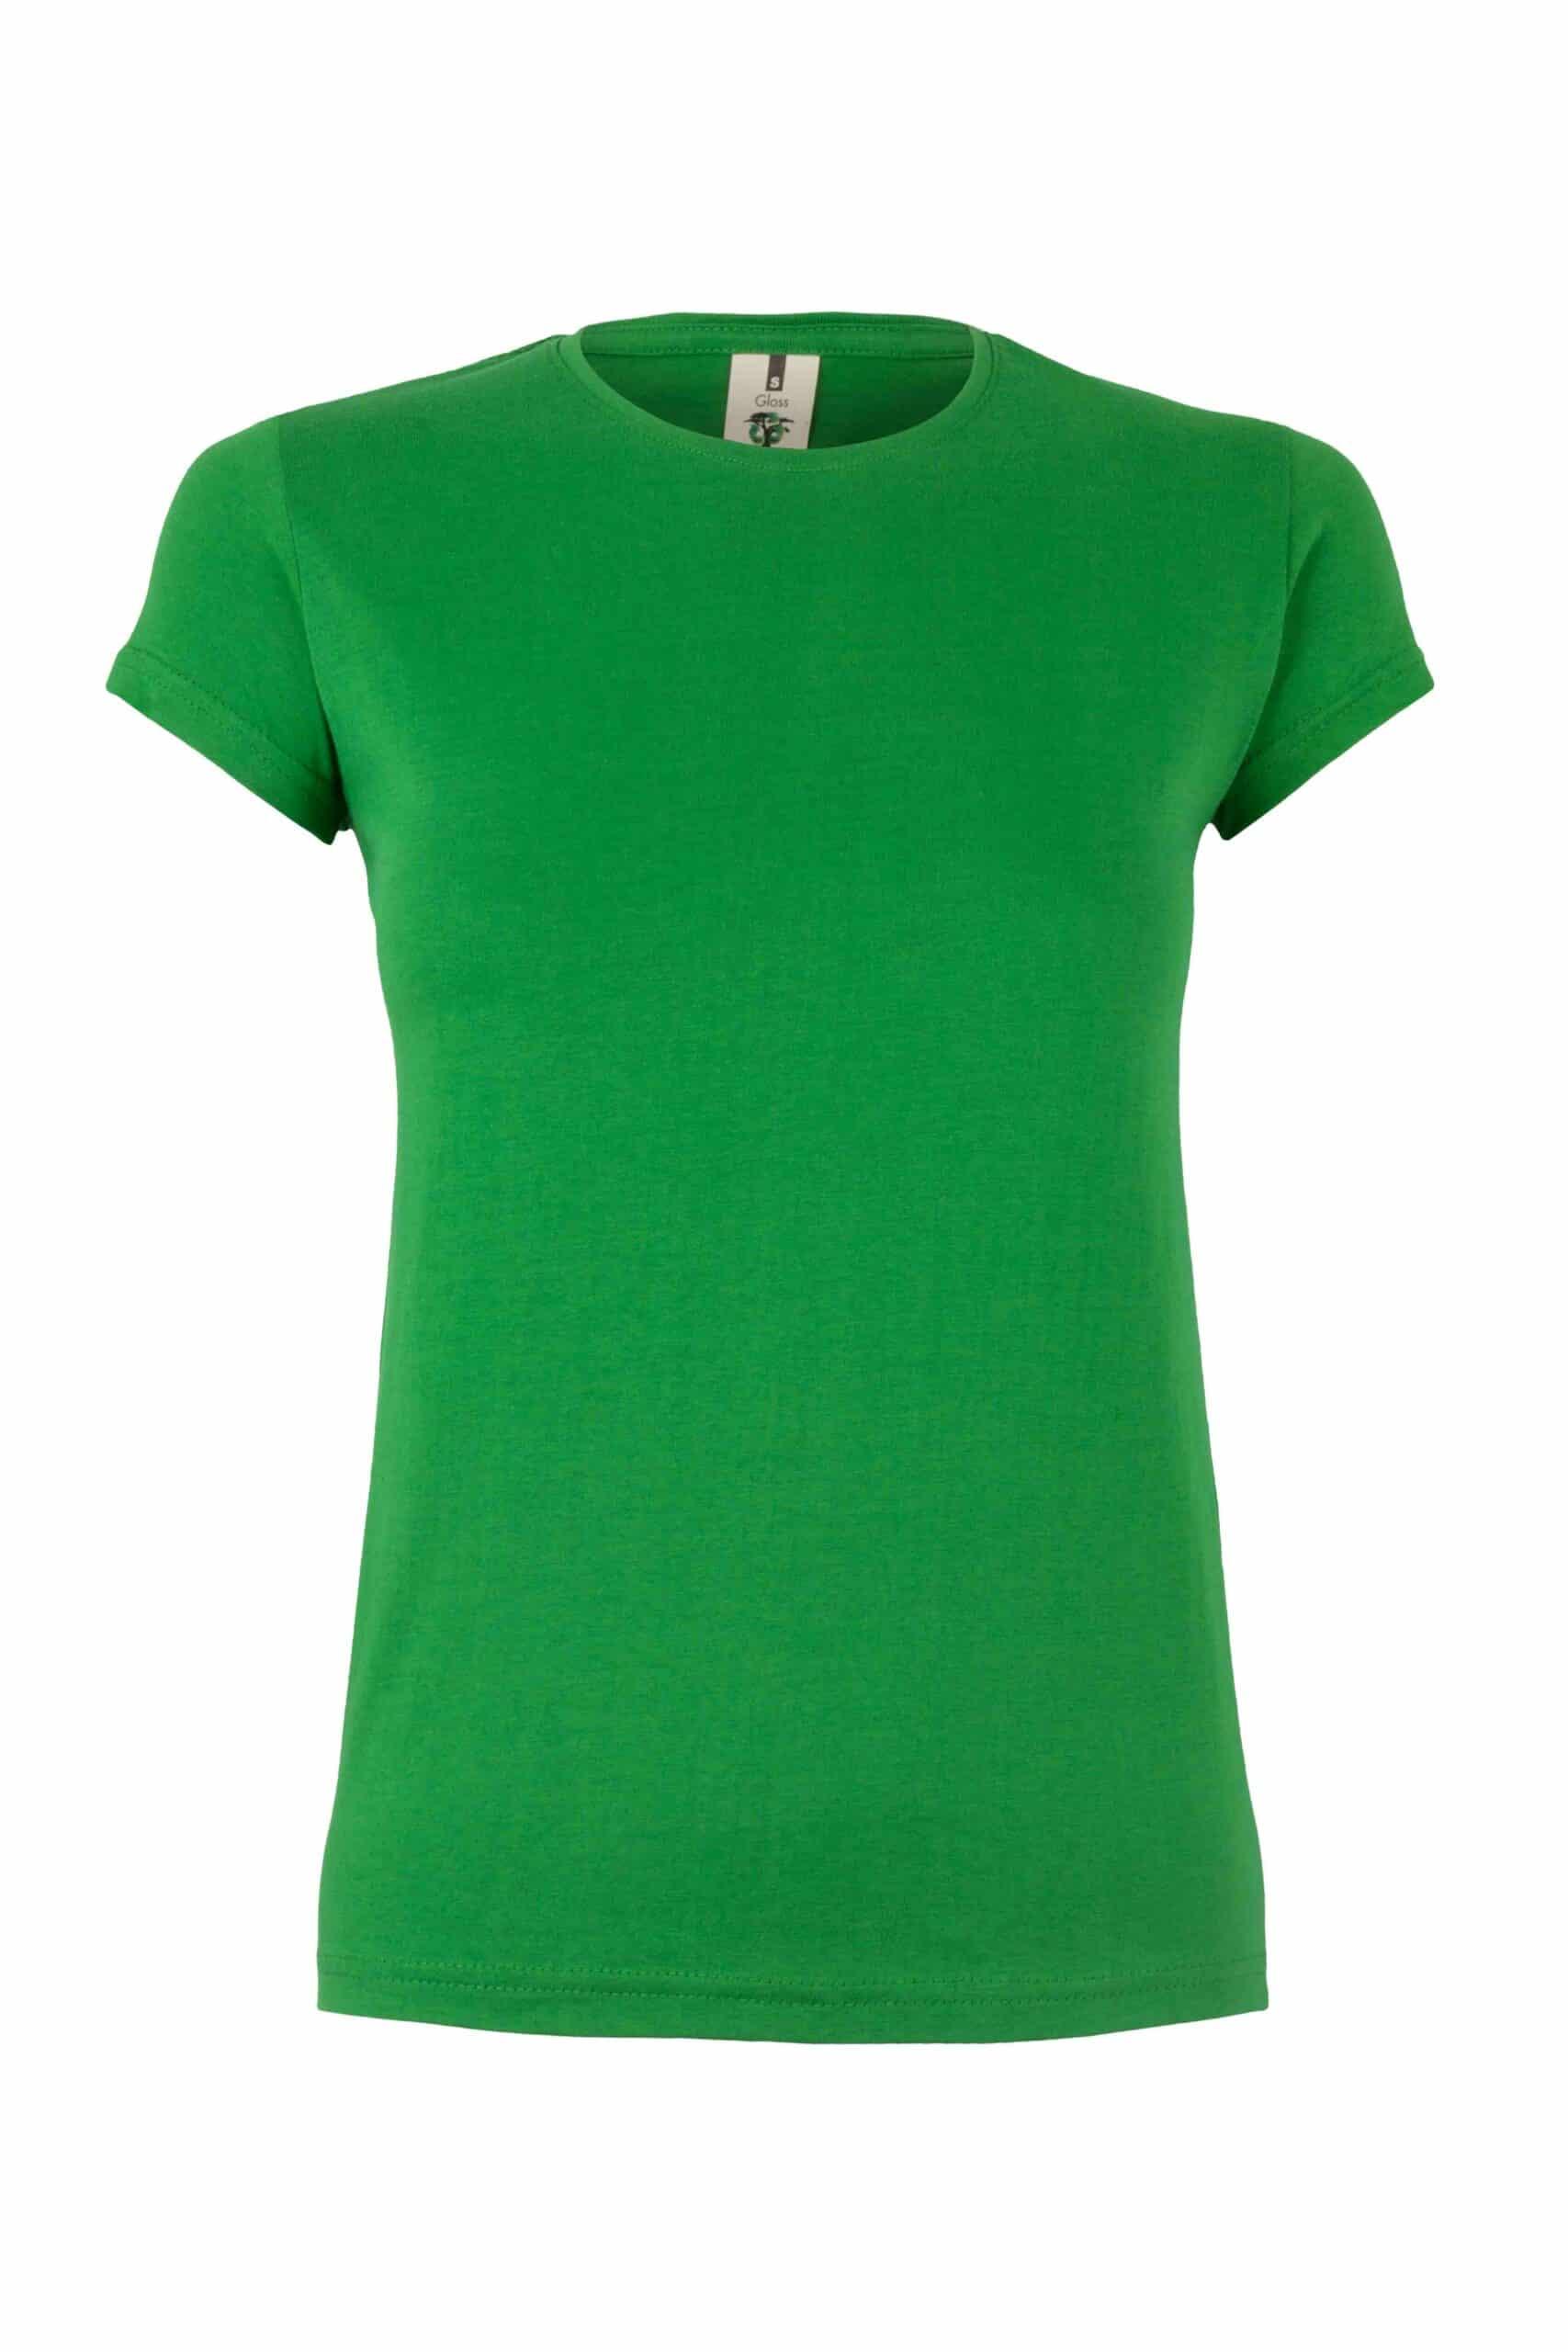 Mukua Mk170cv Camiseta Manga Corta 130gr Real Green